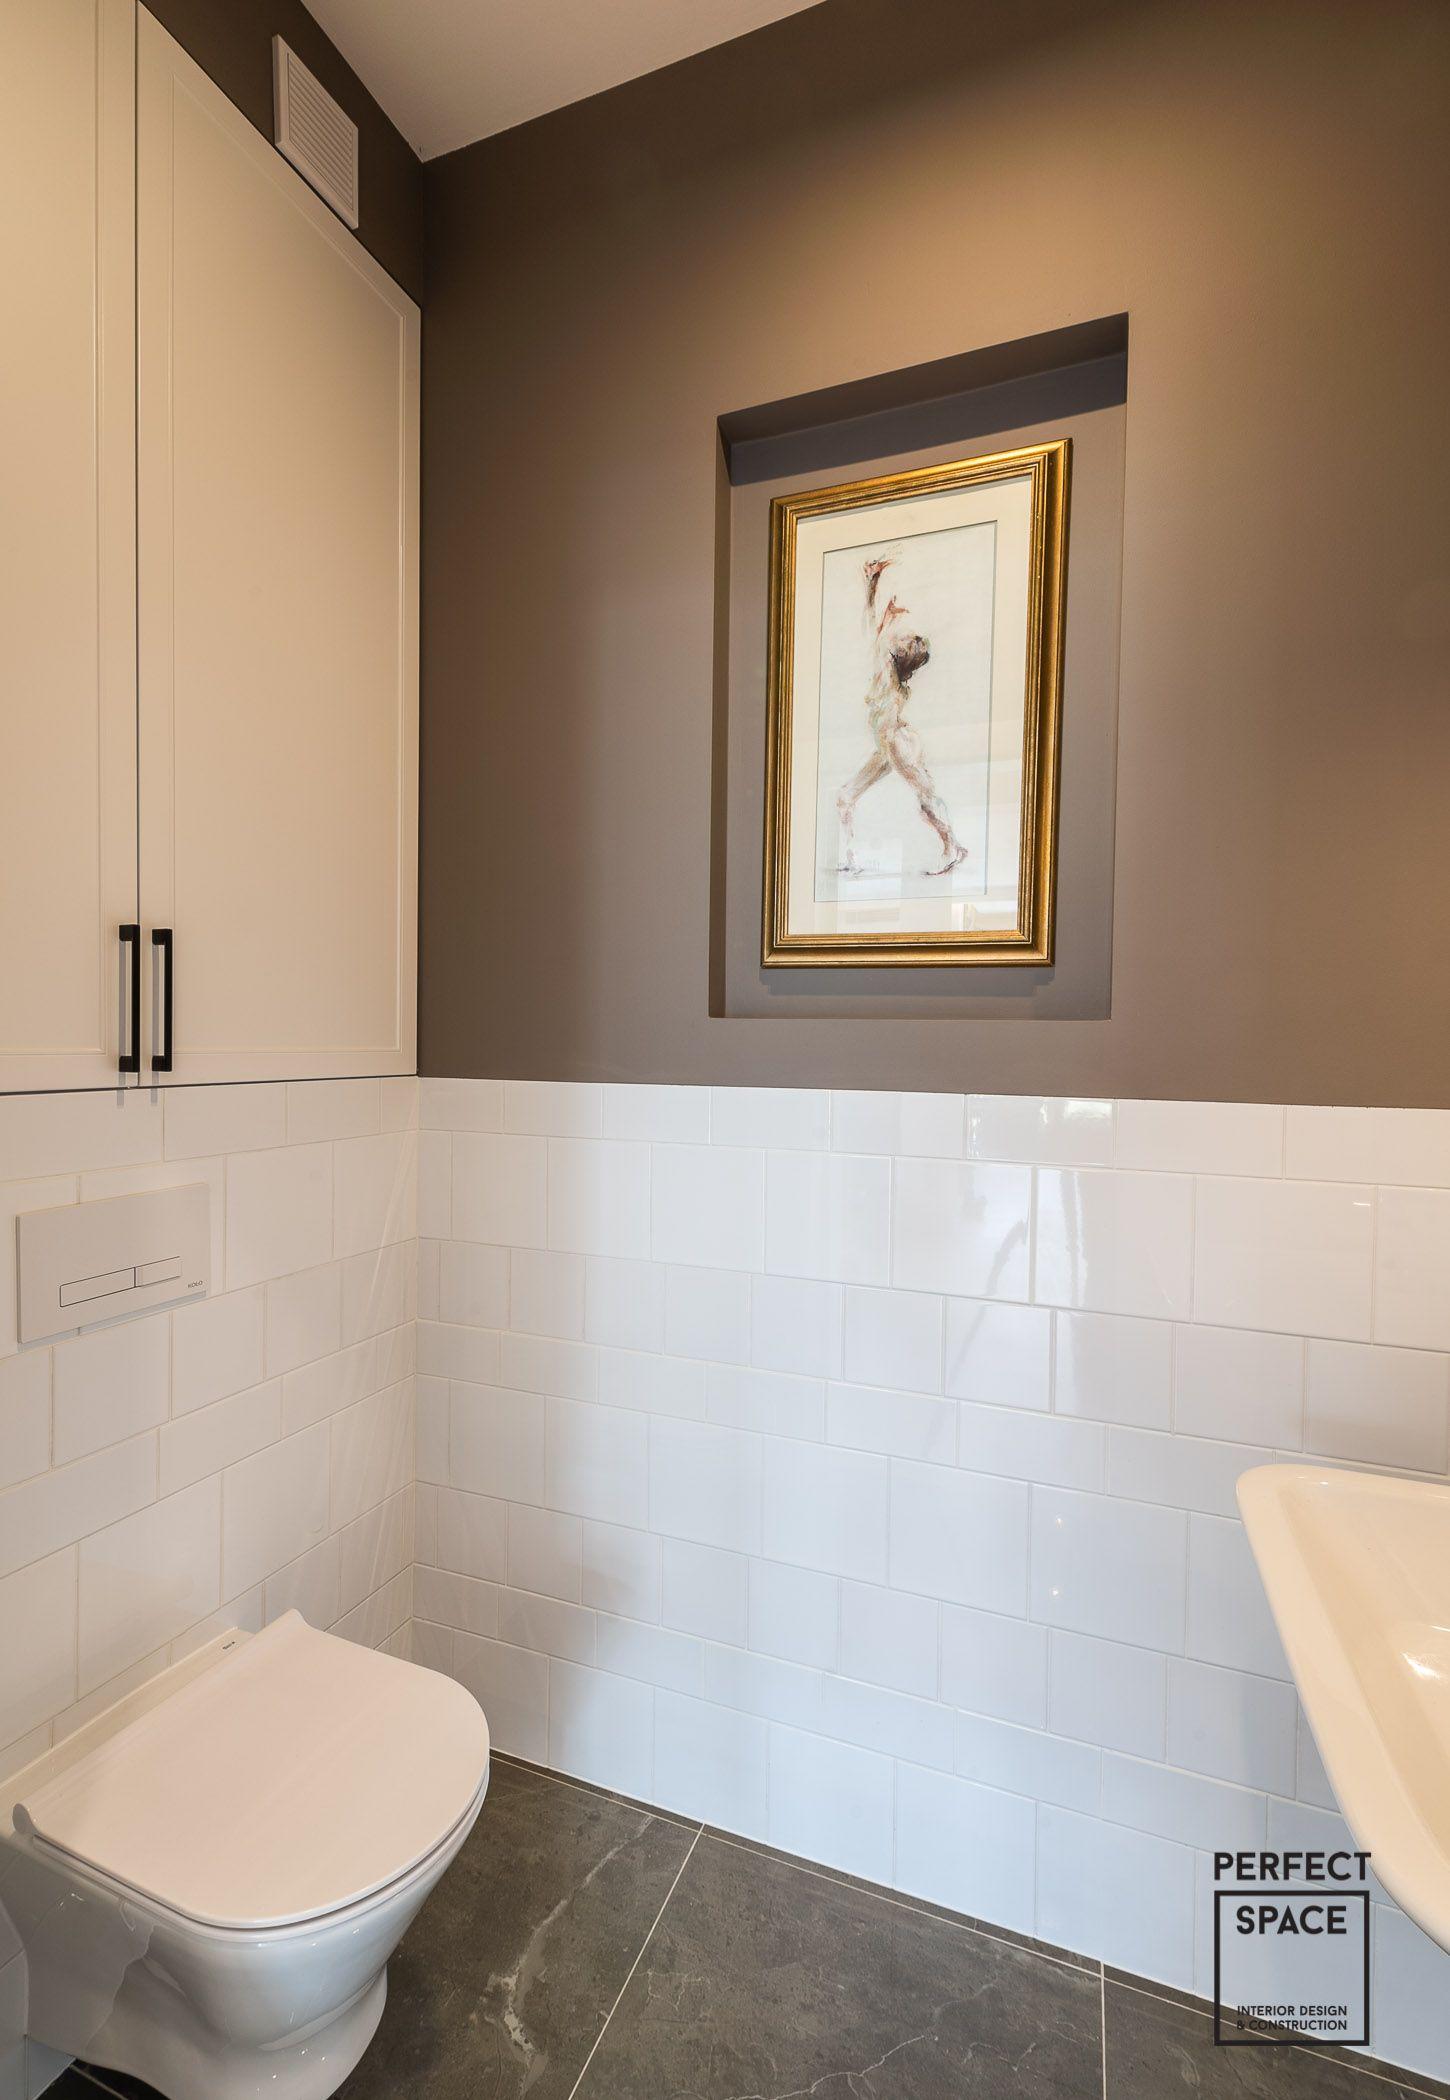 Pin On Small Bathroom Mała łazienka